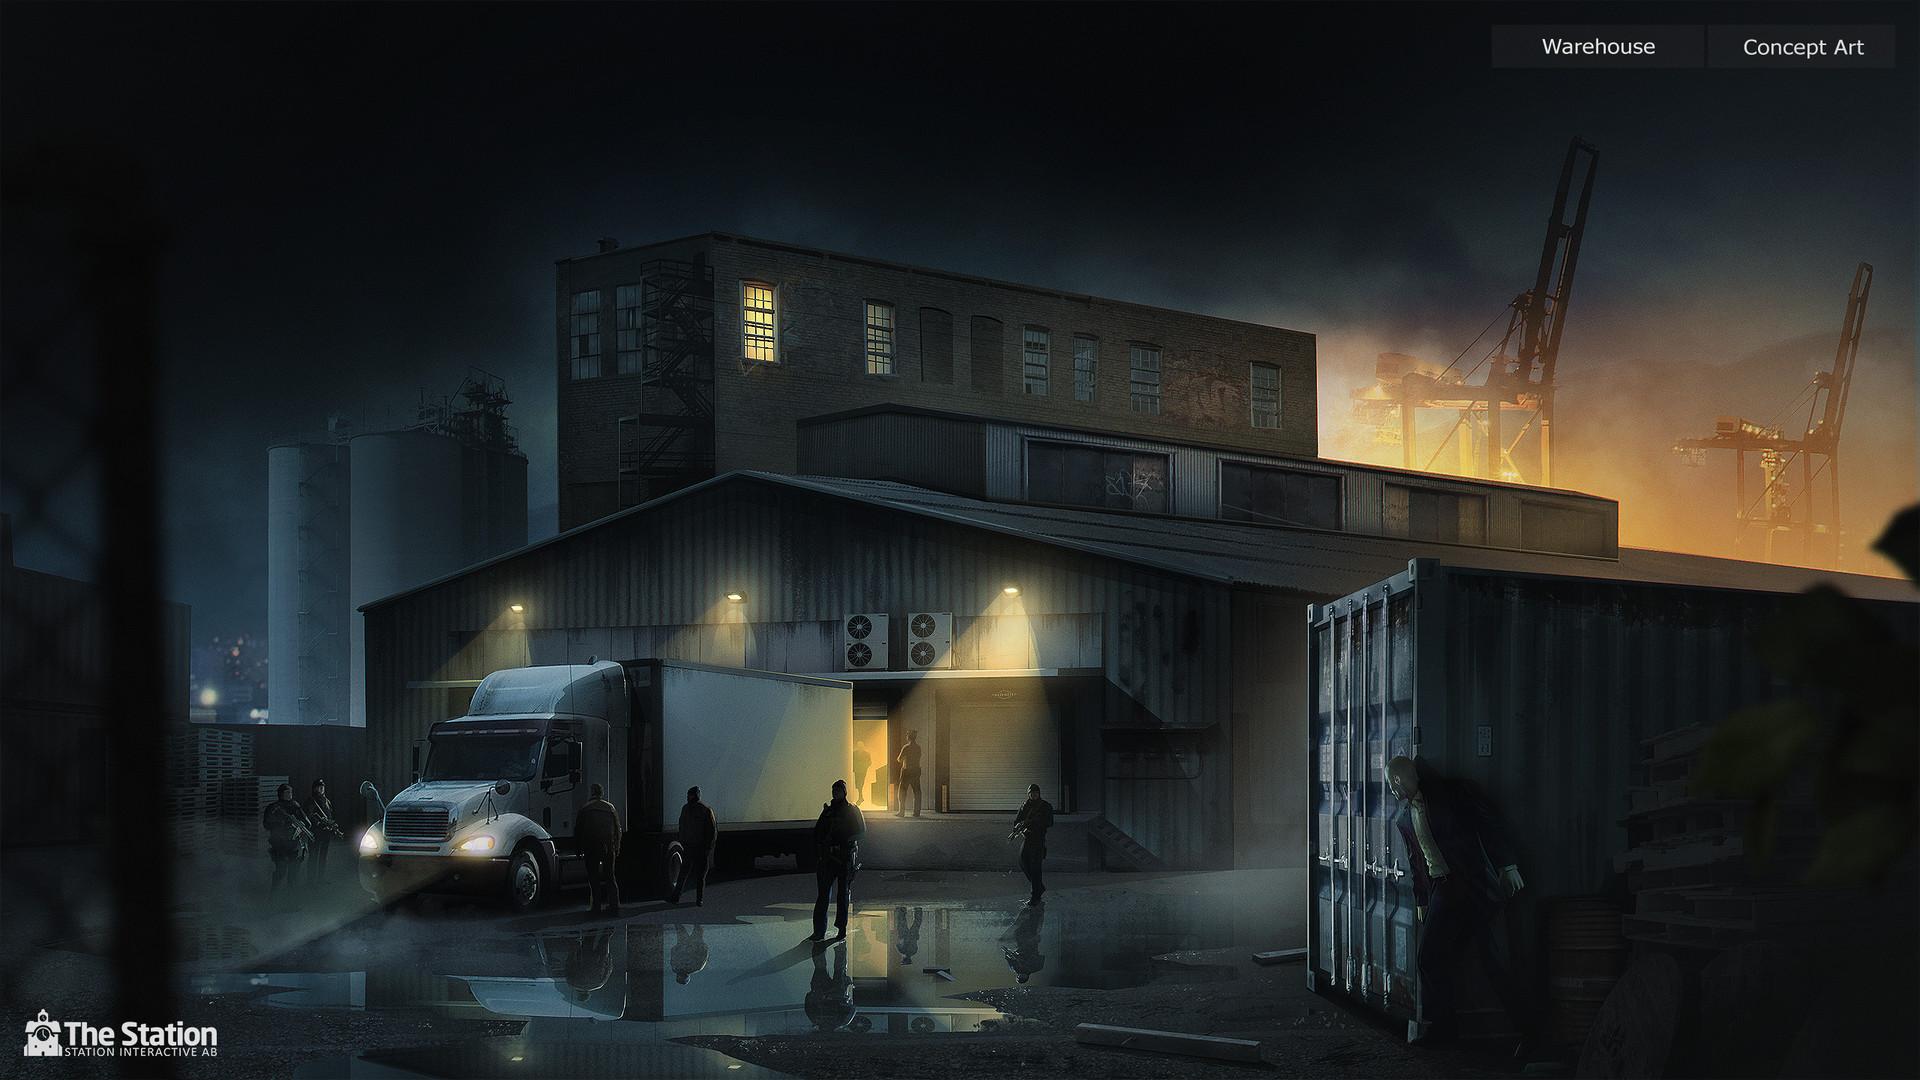 « Une histoire de famille » ft. W.R Wintergreen Station-interactive-warehouse